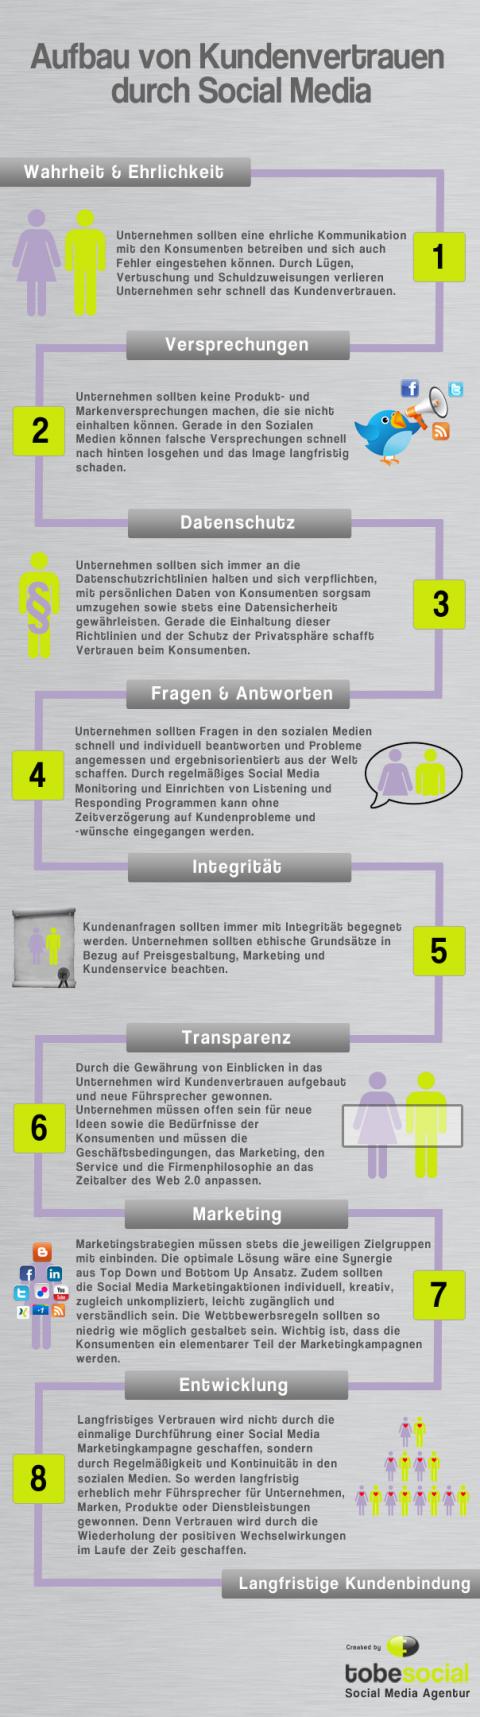 tobesocial-kundenbindung-kundengewinnung-social-media-marketing_0